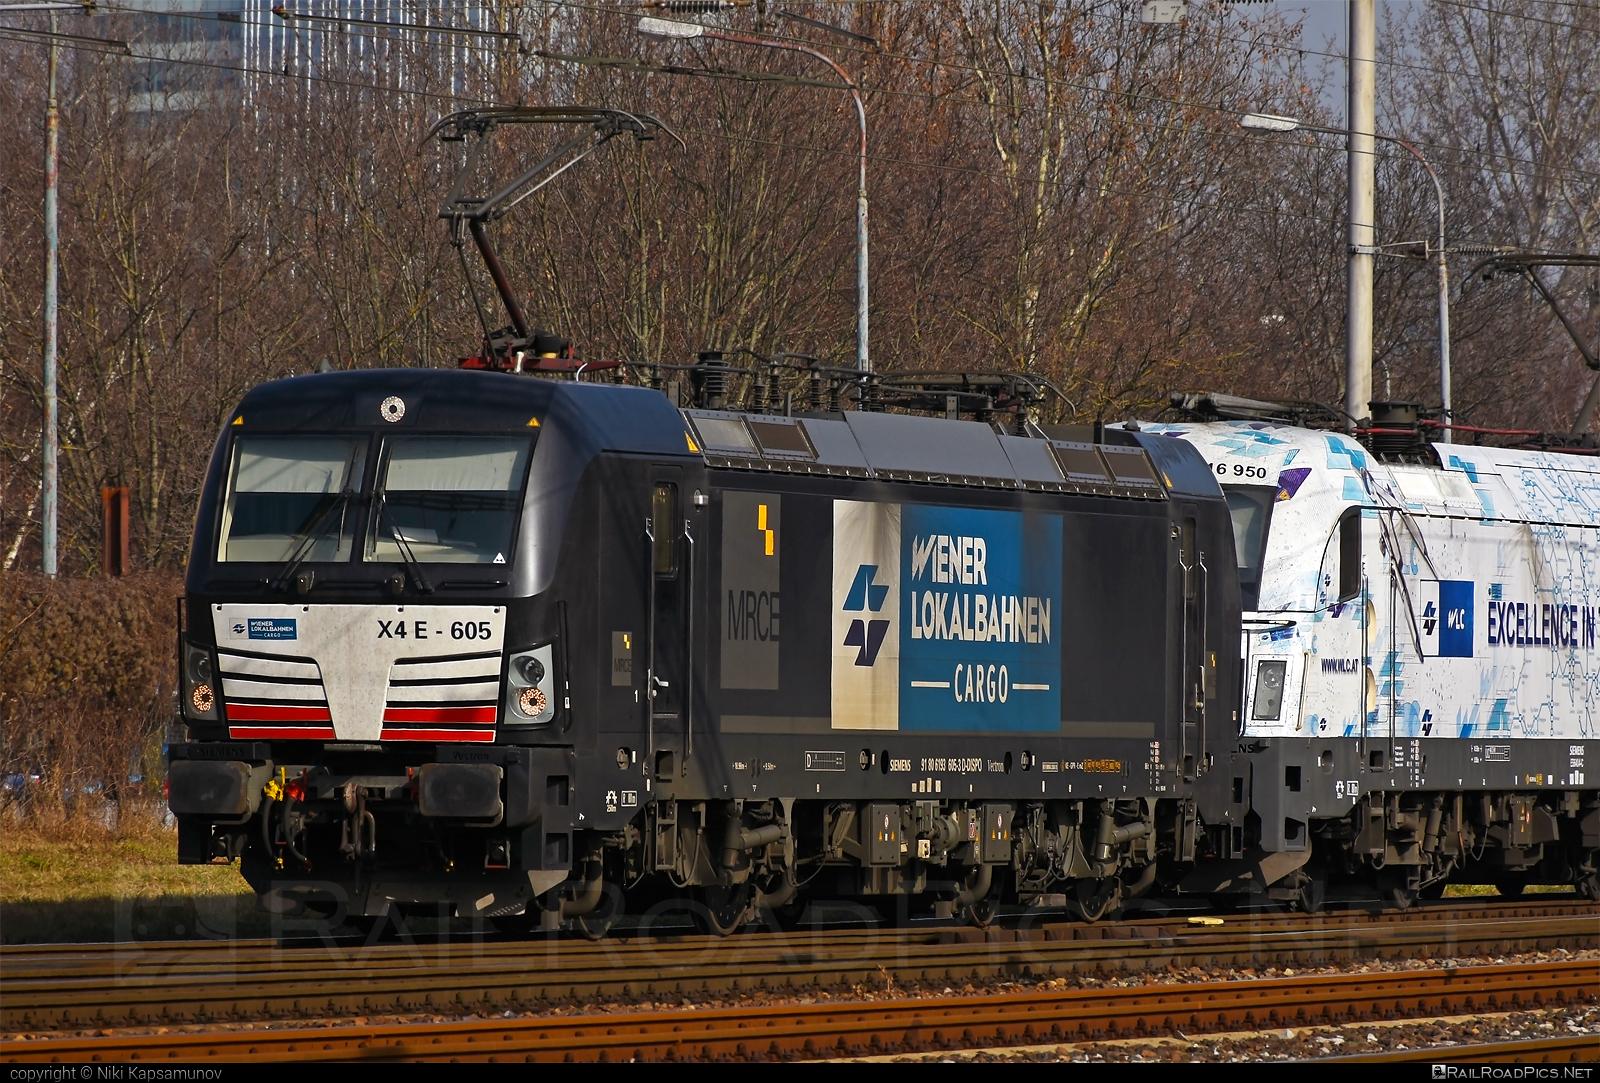 Siemens Vectron AC - 193 605 operated by Wiener Lokalbahnen Cargo GmbH #dispolok #mitsuirailcapitaleurope #mitsuirailcapitaleuropegmbh #mrce #siemens #siemensvectron #siemensvectronac #vectron #vectronac #wienerlokalbahnencargo #wienerlokalbahnencargogmbh #wlc